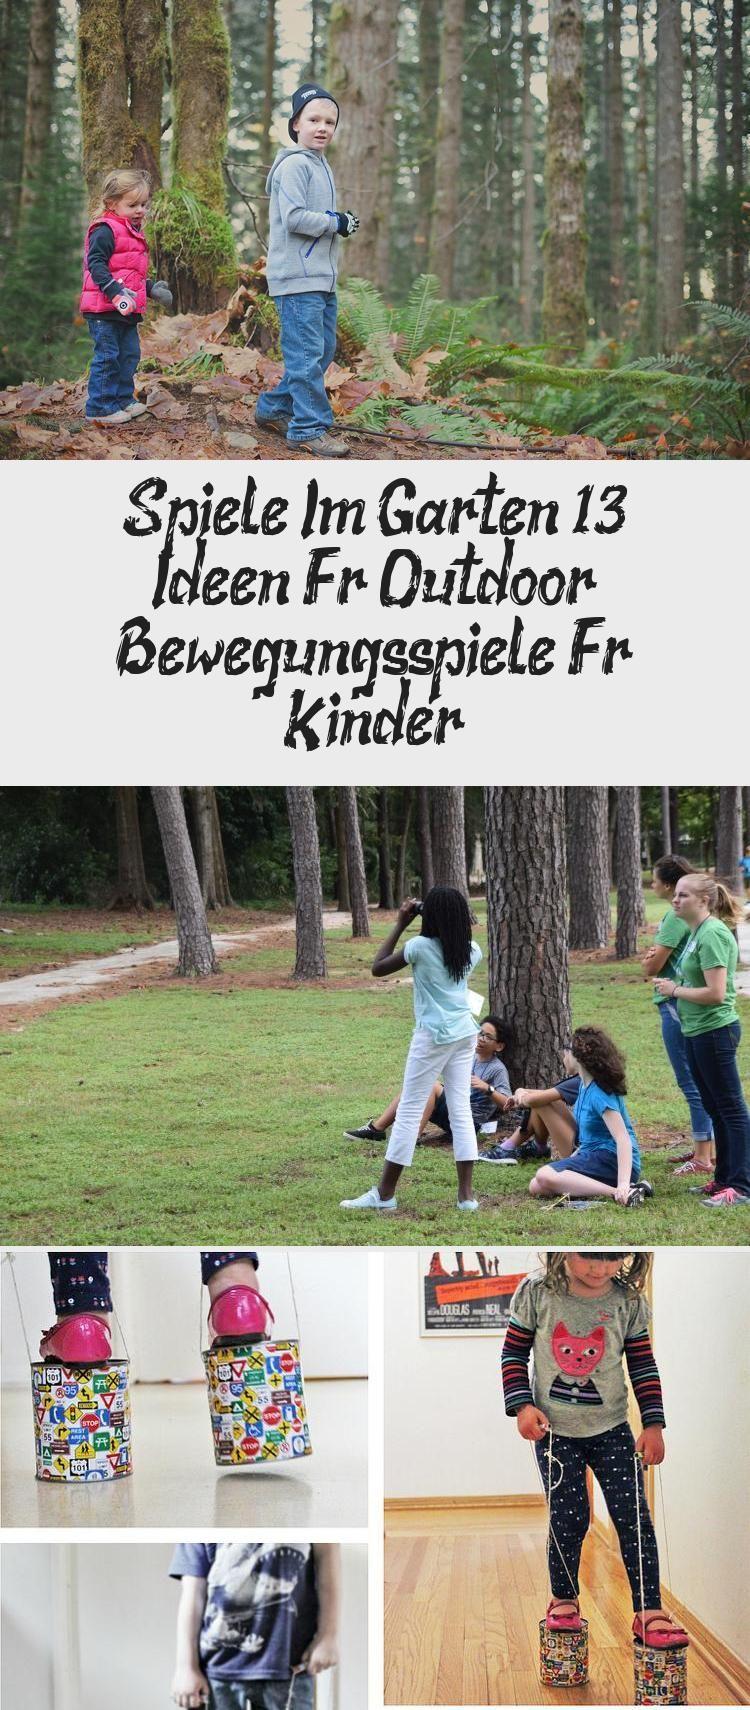 Spiele Im Garten 13 Ideen Fur Outdoor Bewegungsspiele Fur Kinder In 2020 Baseball Cards Sports